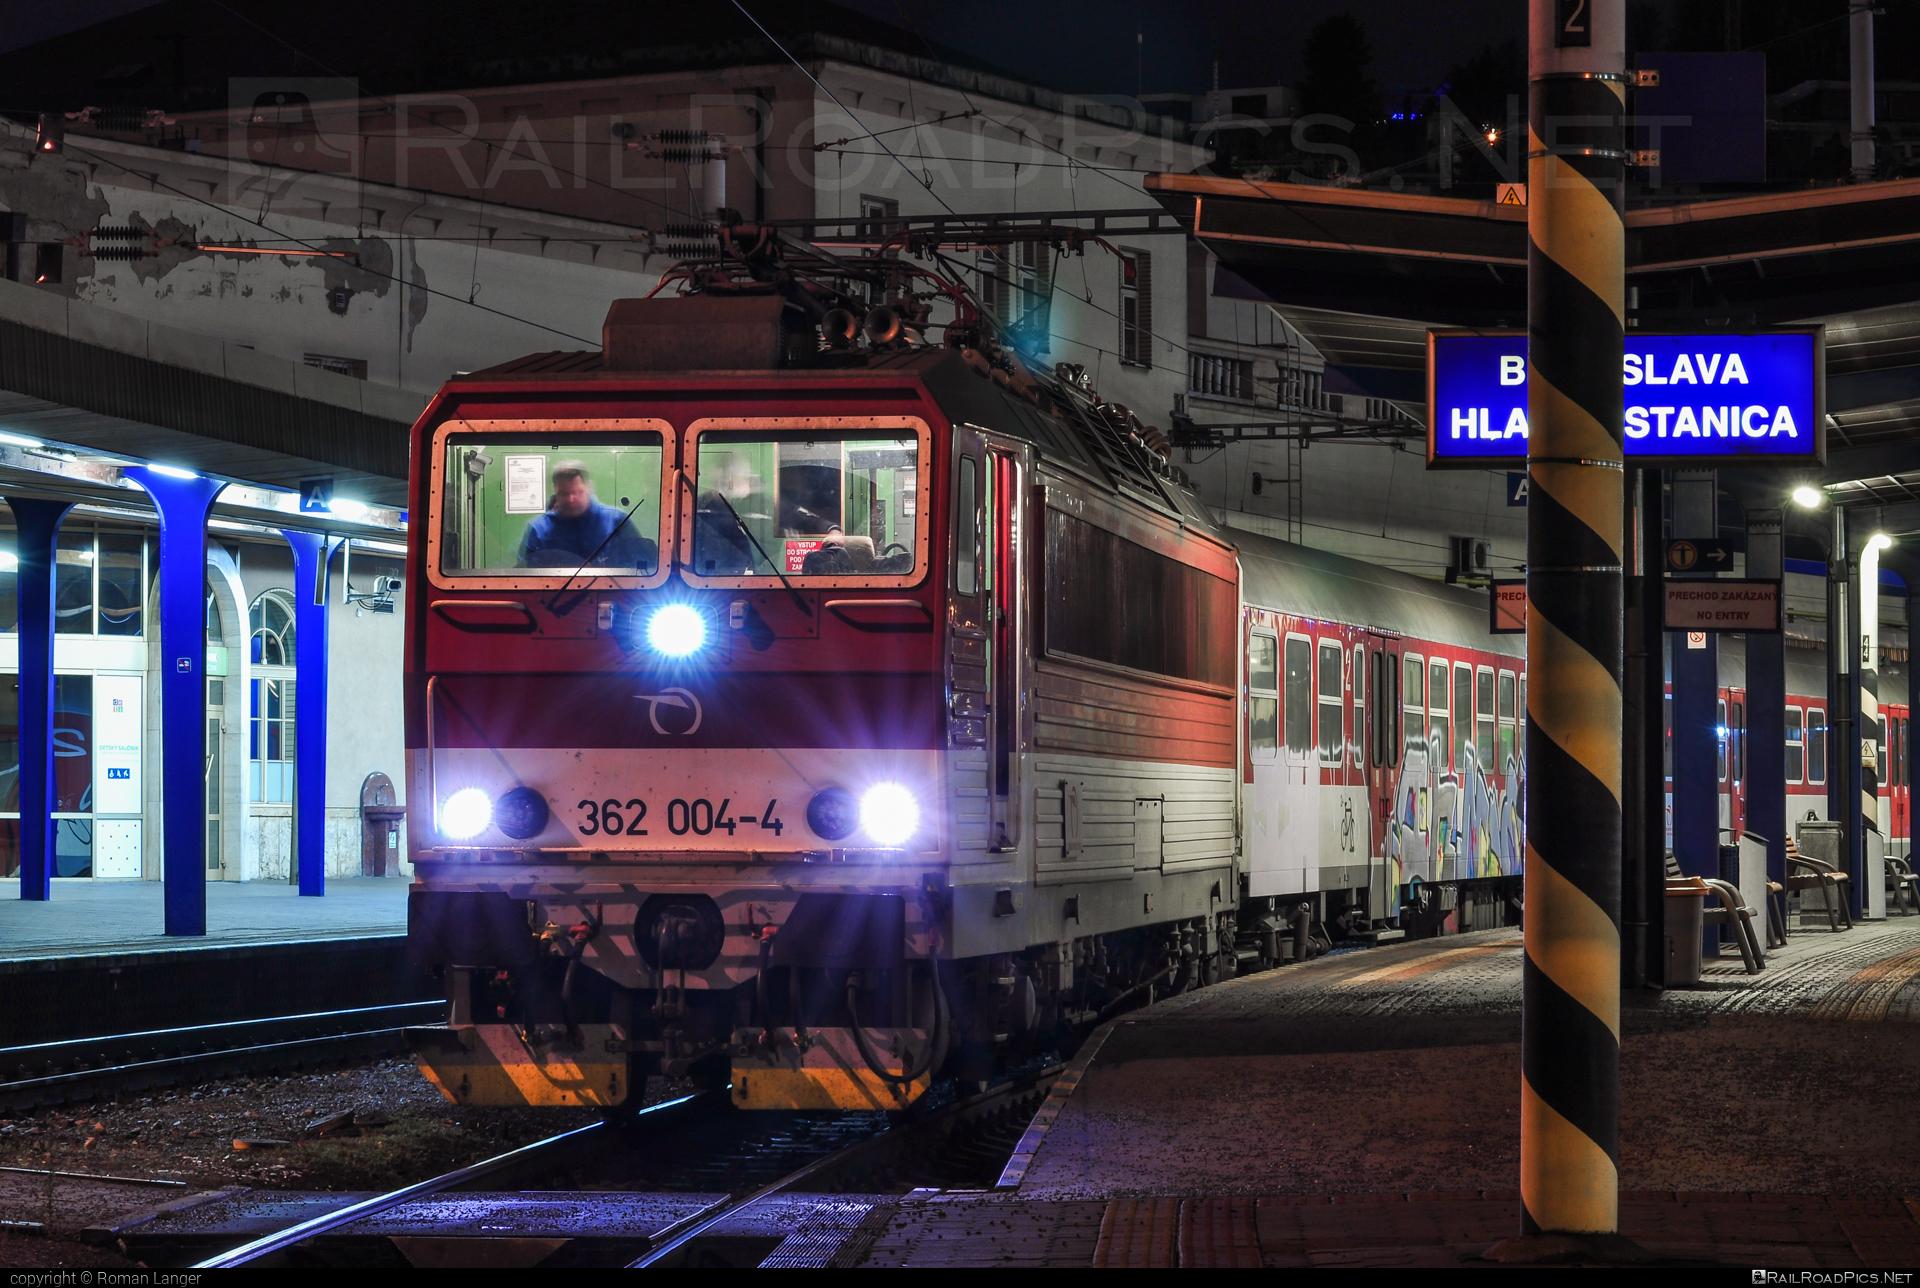 Škoda 69Er - 362 004-4 operated by Železničná Spoločnost' Slovensko, a.s. #ZeleznicnaSpolocnostSlovensko #eso #locomotive362 #rychleeso #skoda #skoda69er #zssk